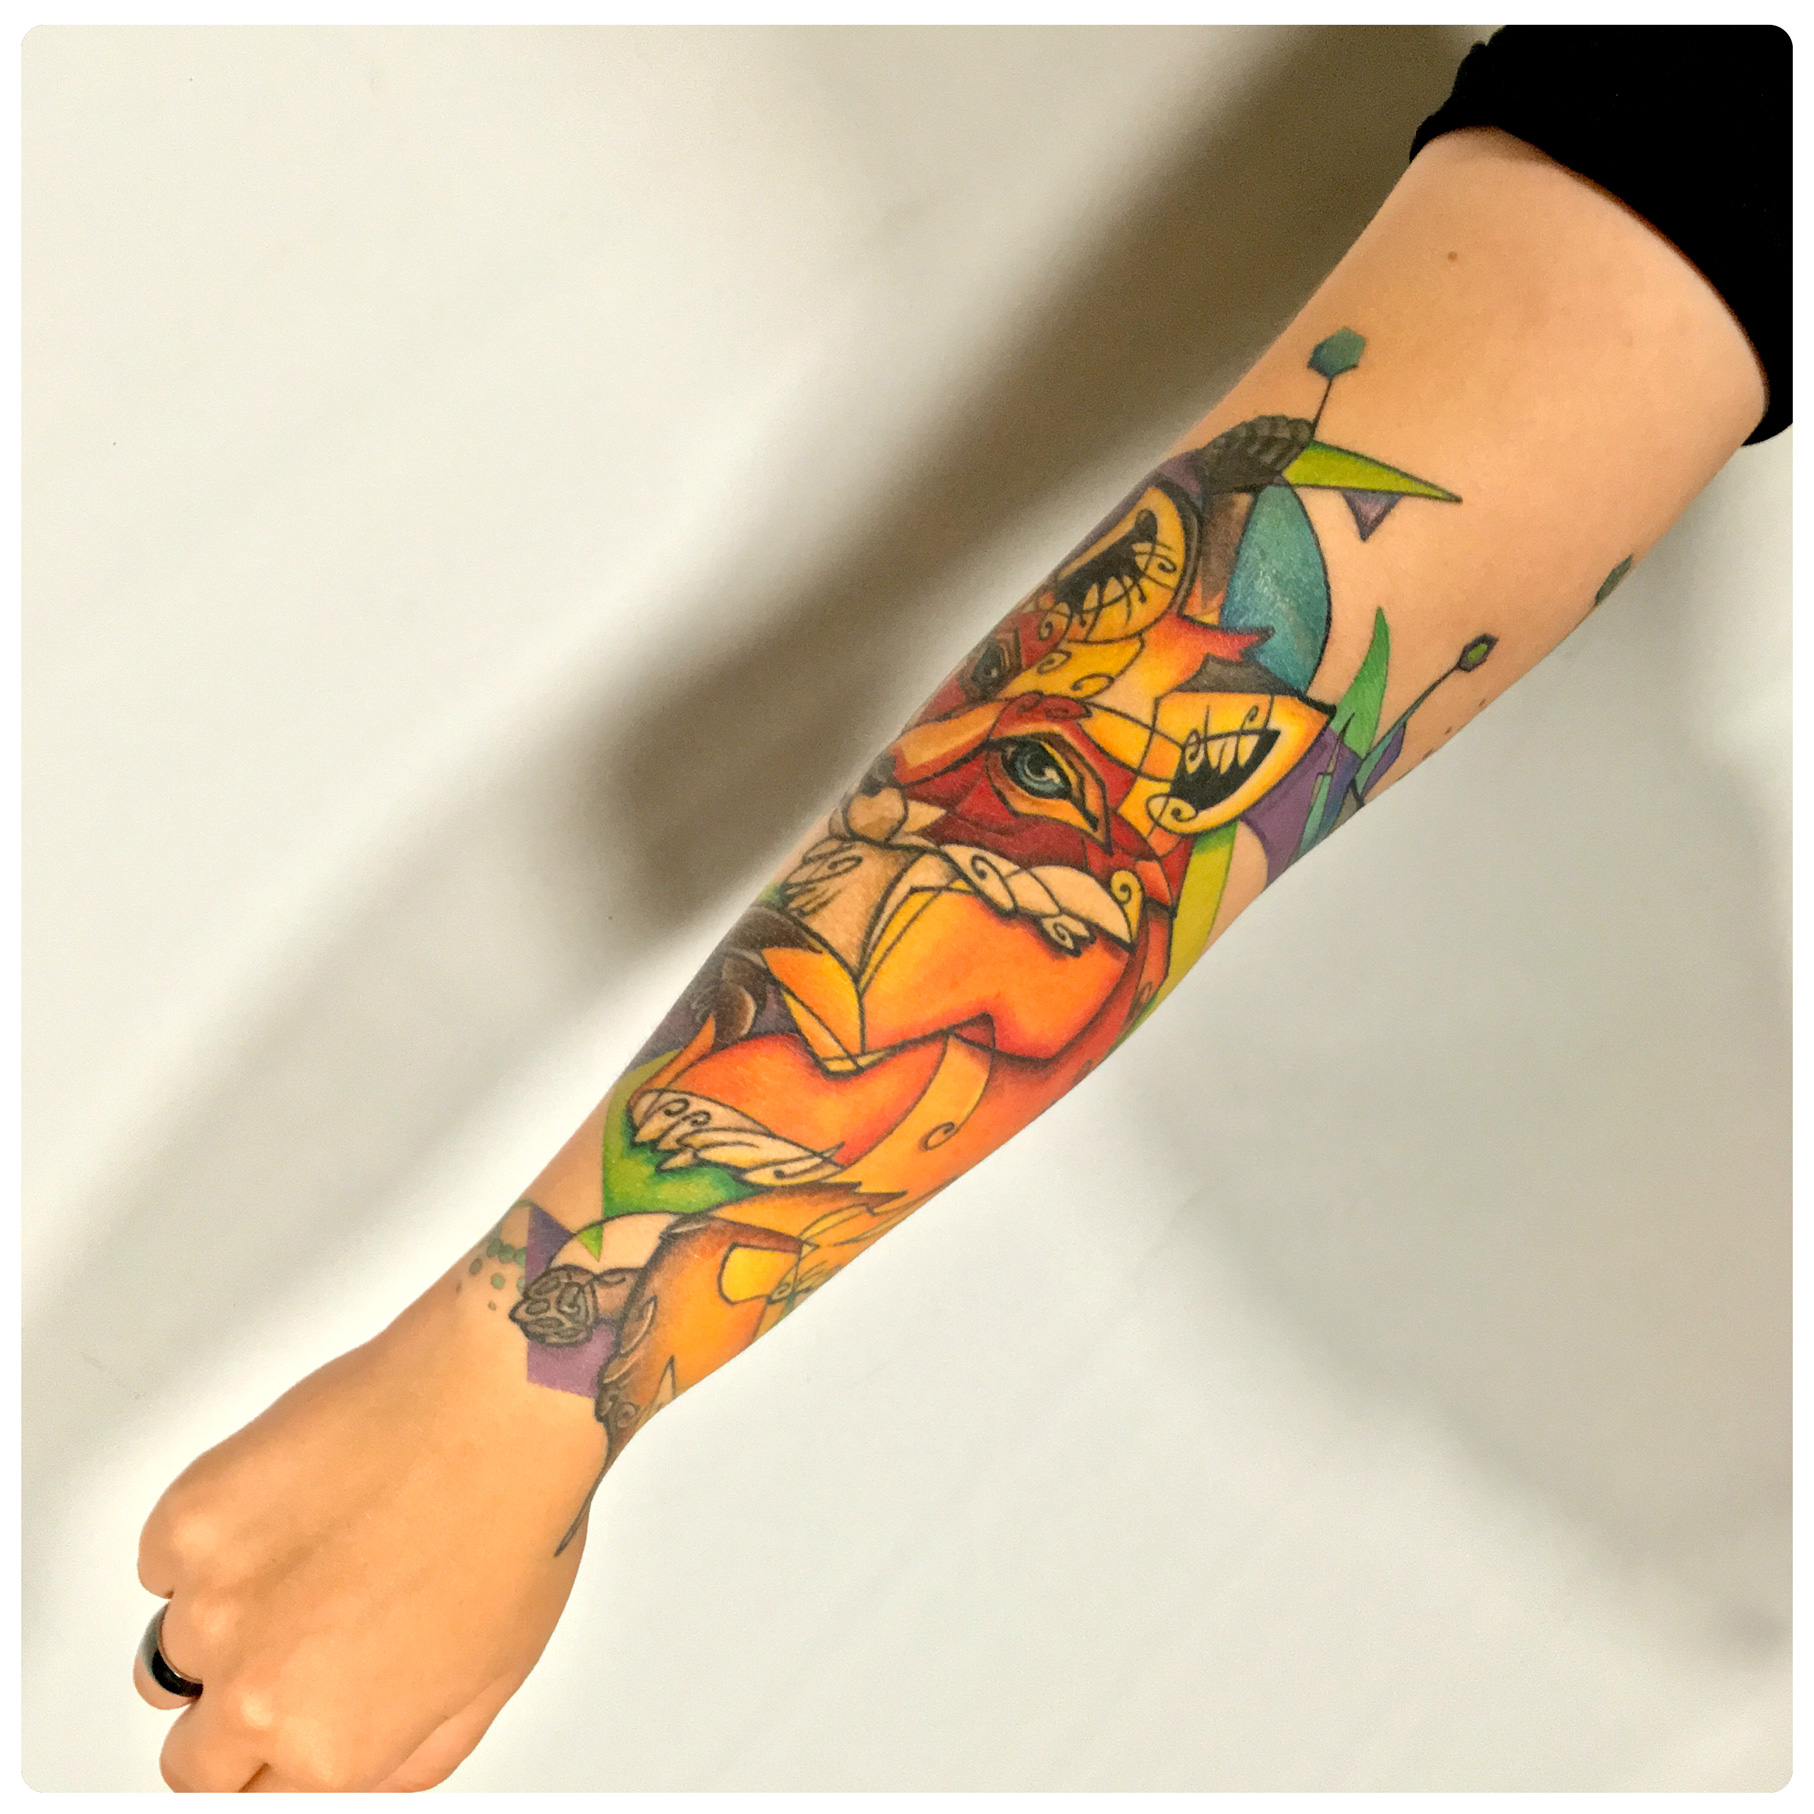 web-4_2016_tattoo_forearm_fox-shark-abstract.jpg